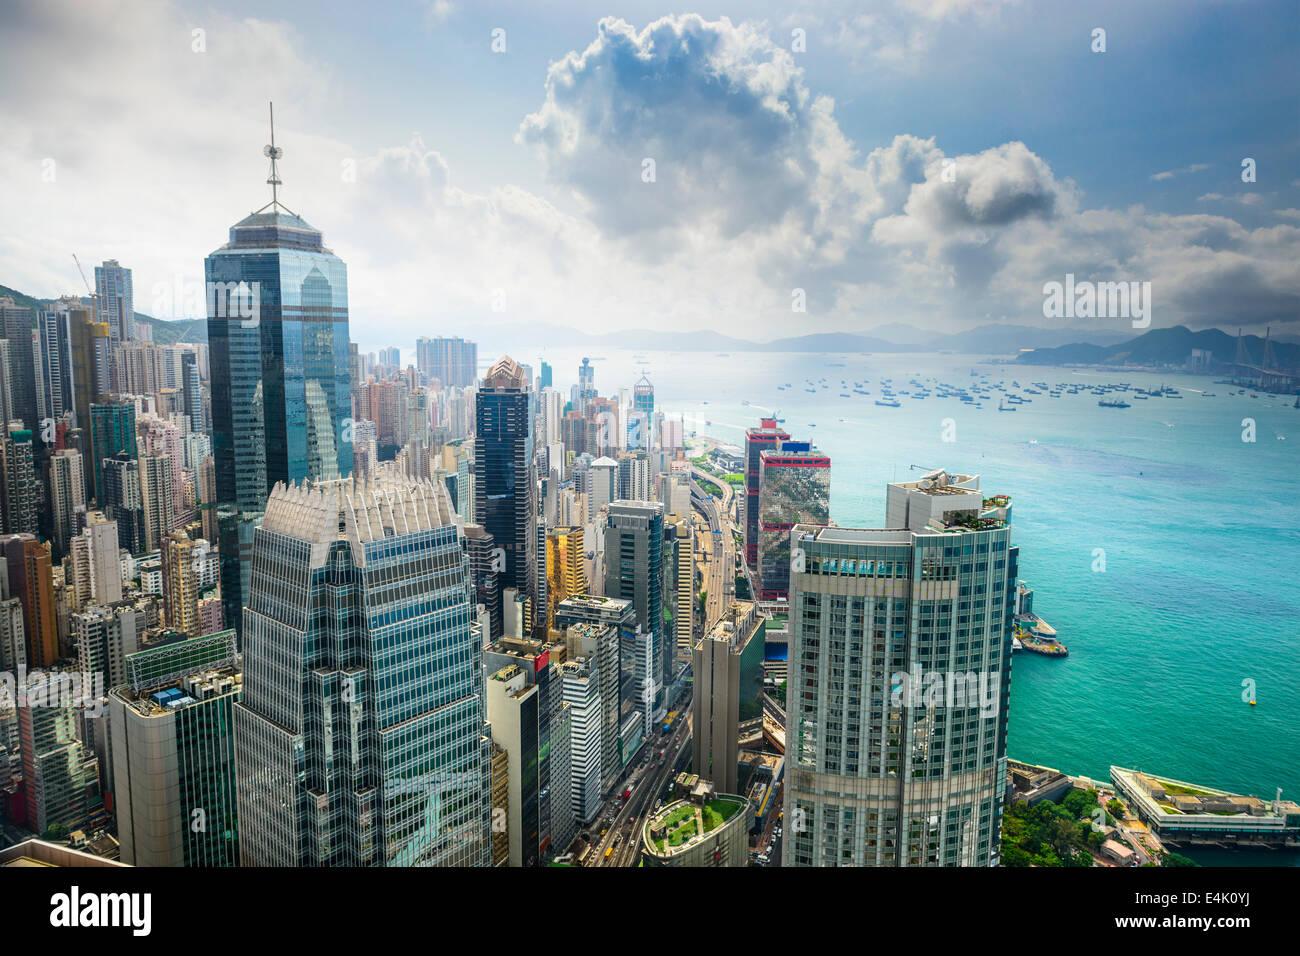 Hong Kong, China aerial view of the cityscape at Victoria Harbor. - Stock Image